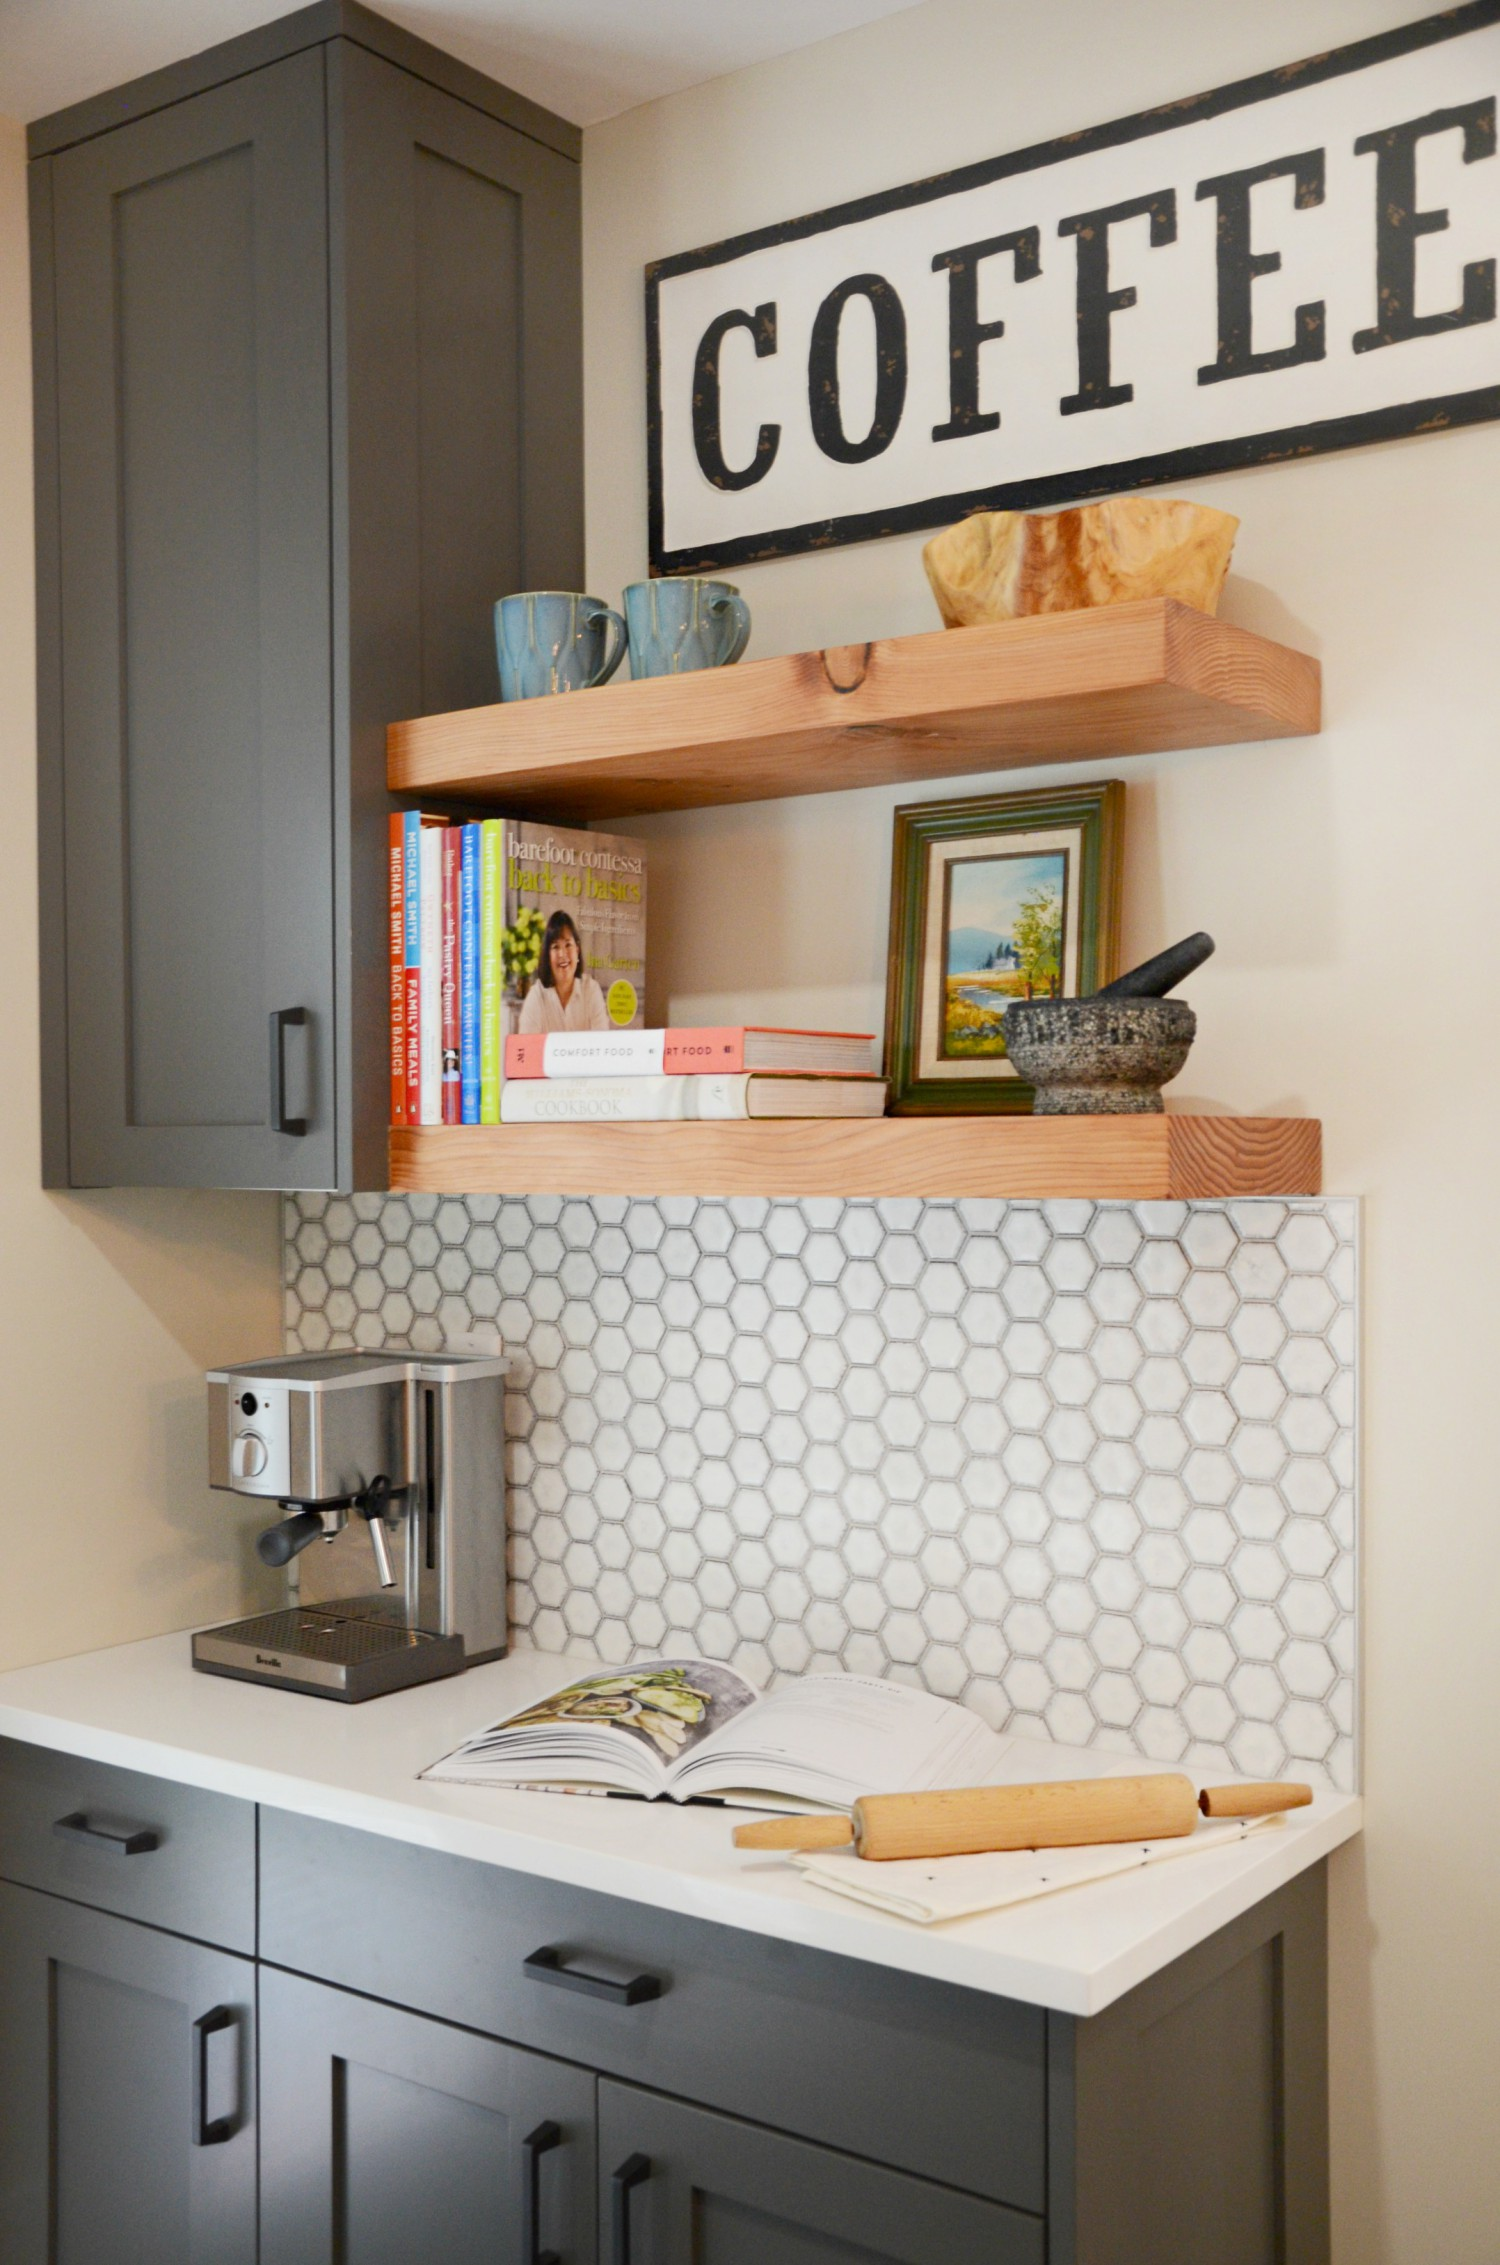 calgary-interior-design-kitchen-renovation-coffee-station-5.jpg